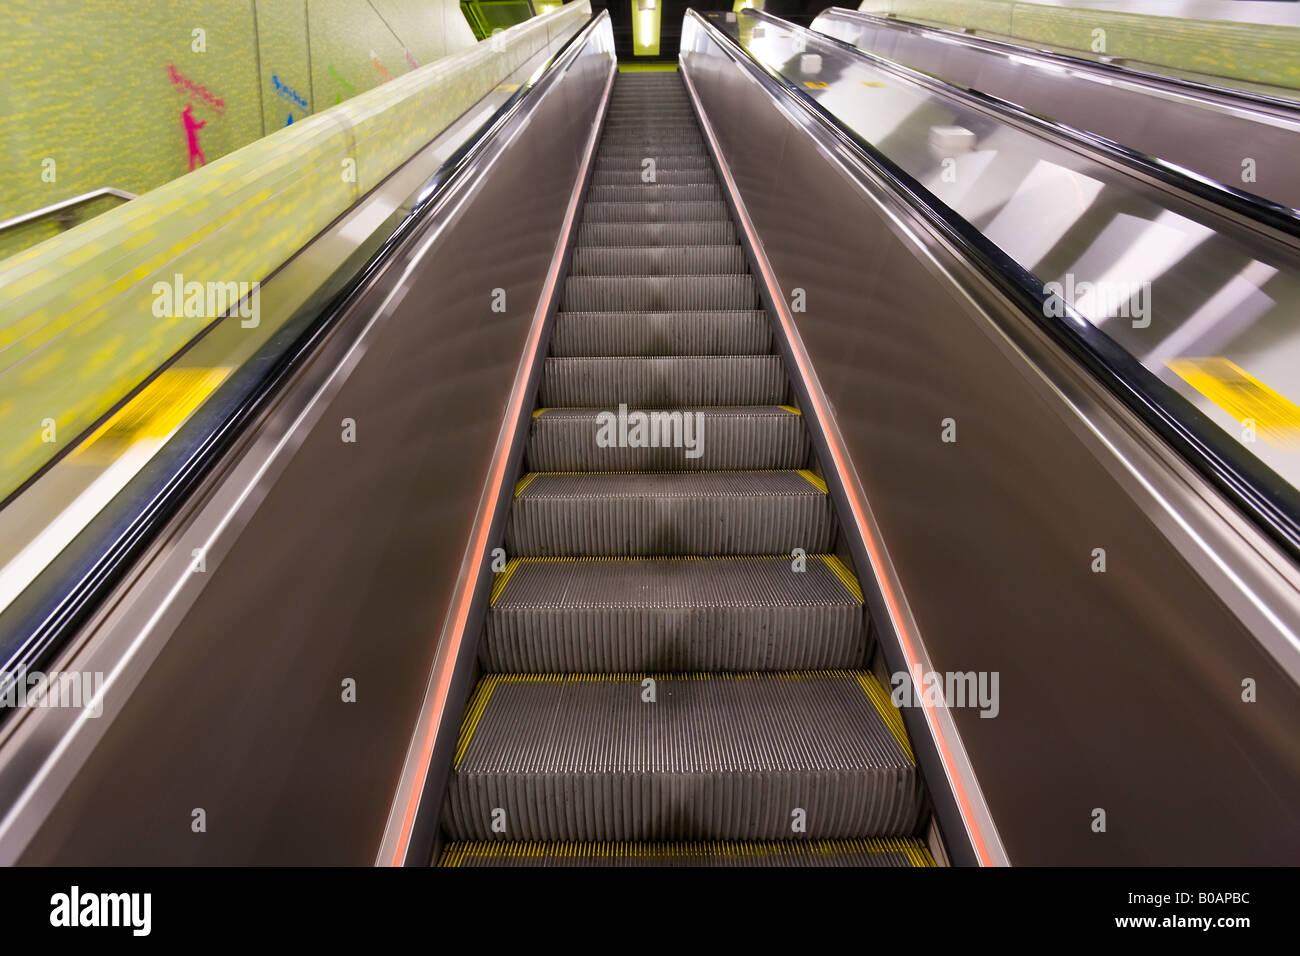 Asia, China, Hong Kong, MTR escalator, underground subway metro station - Stock Image